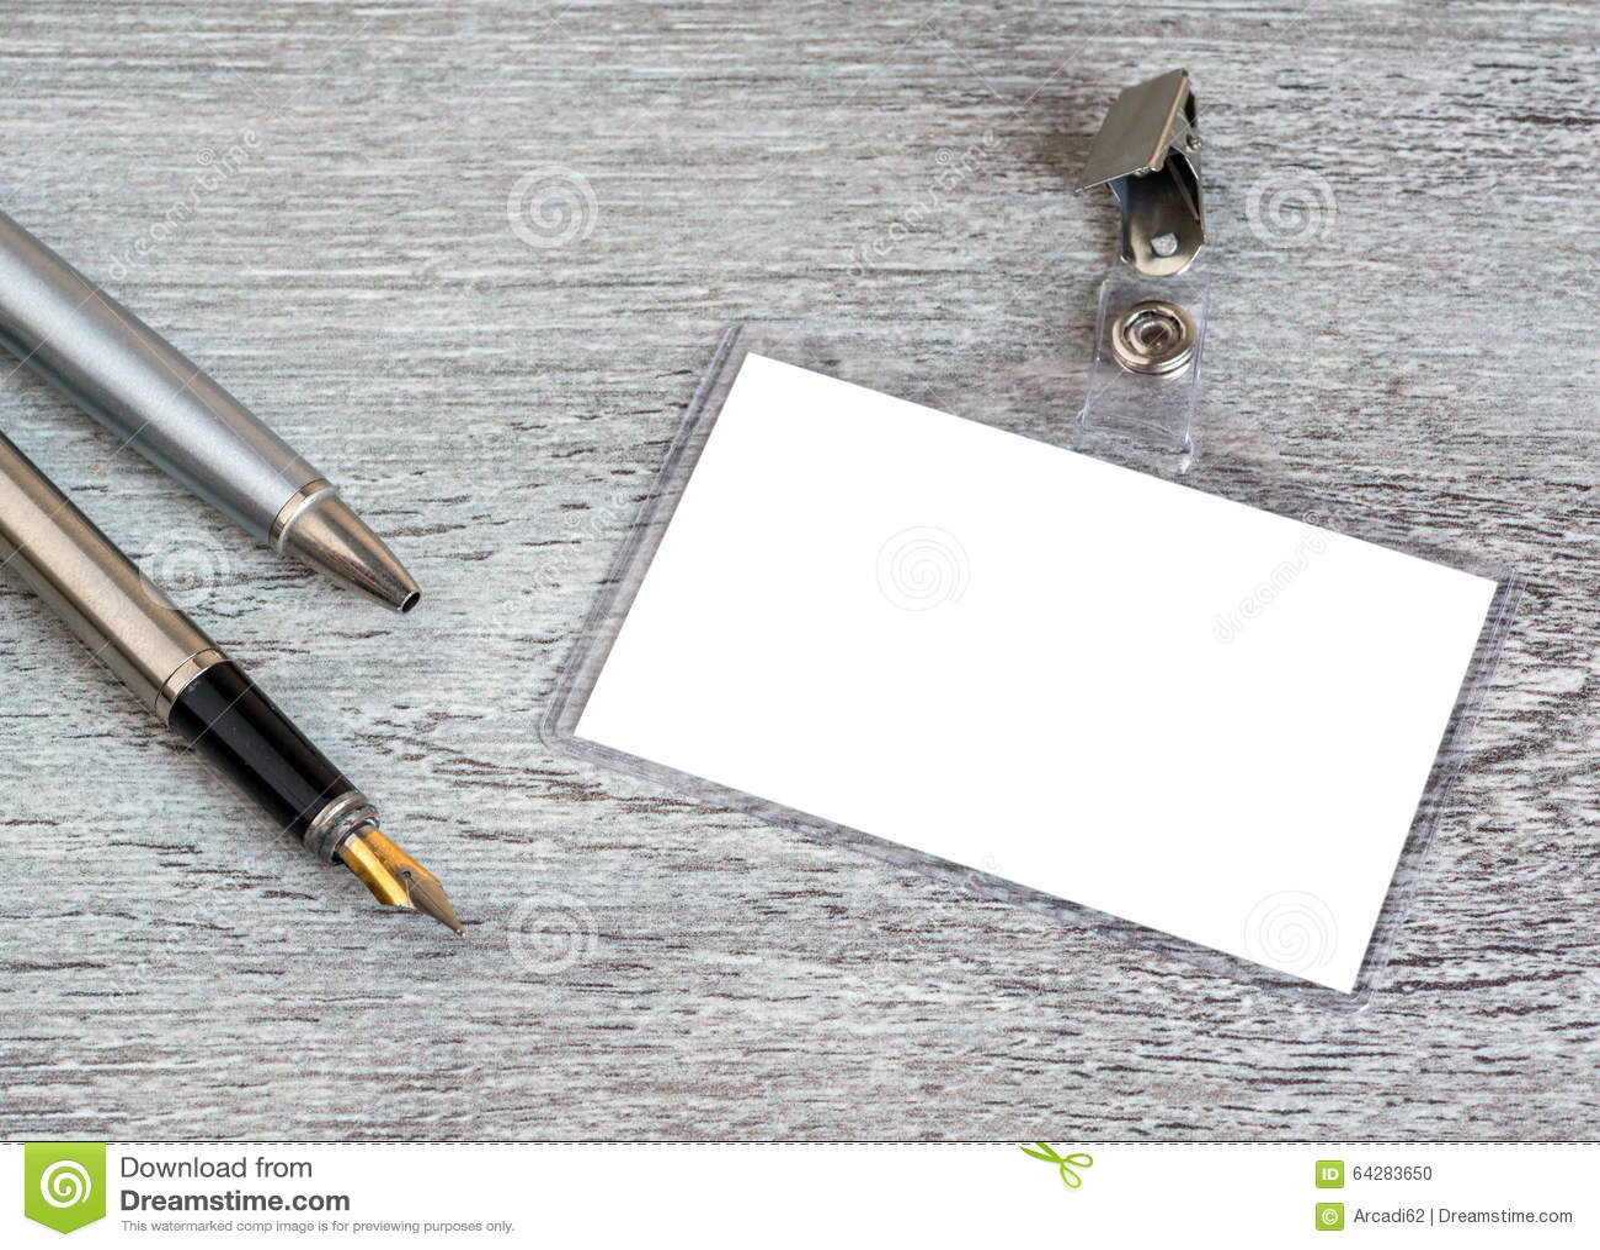 Affär penna, emblem